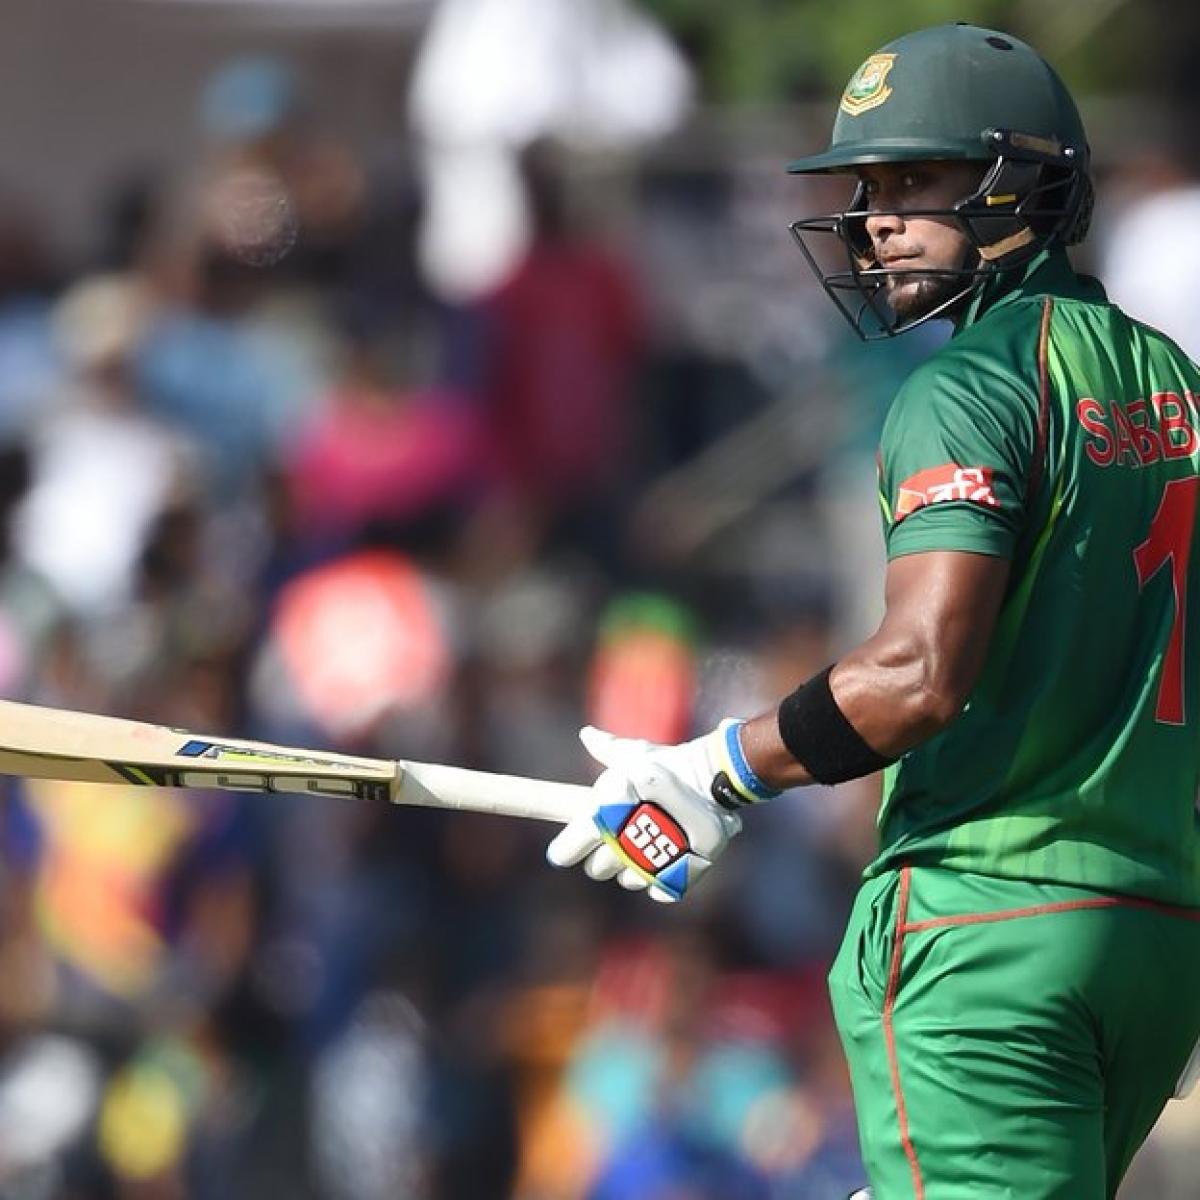 'Not today': Bangladesh batsman Sabbir Rahman recalls the moment when MS Dhoni missed a stumping chance